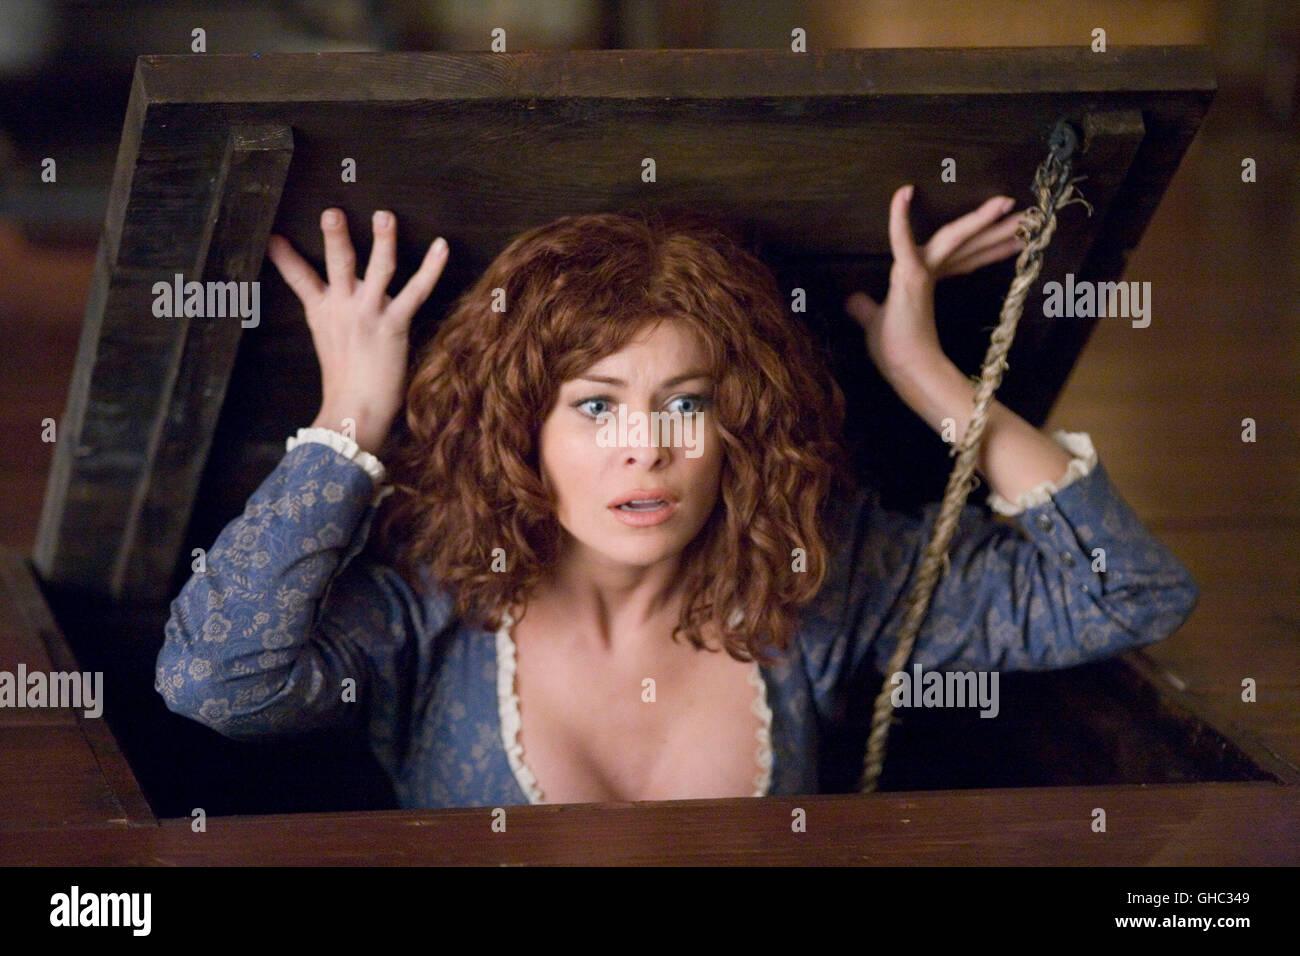 Scary Movie Carmen Electra Stockfotos & Scary Movie Carmen Electra ...